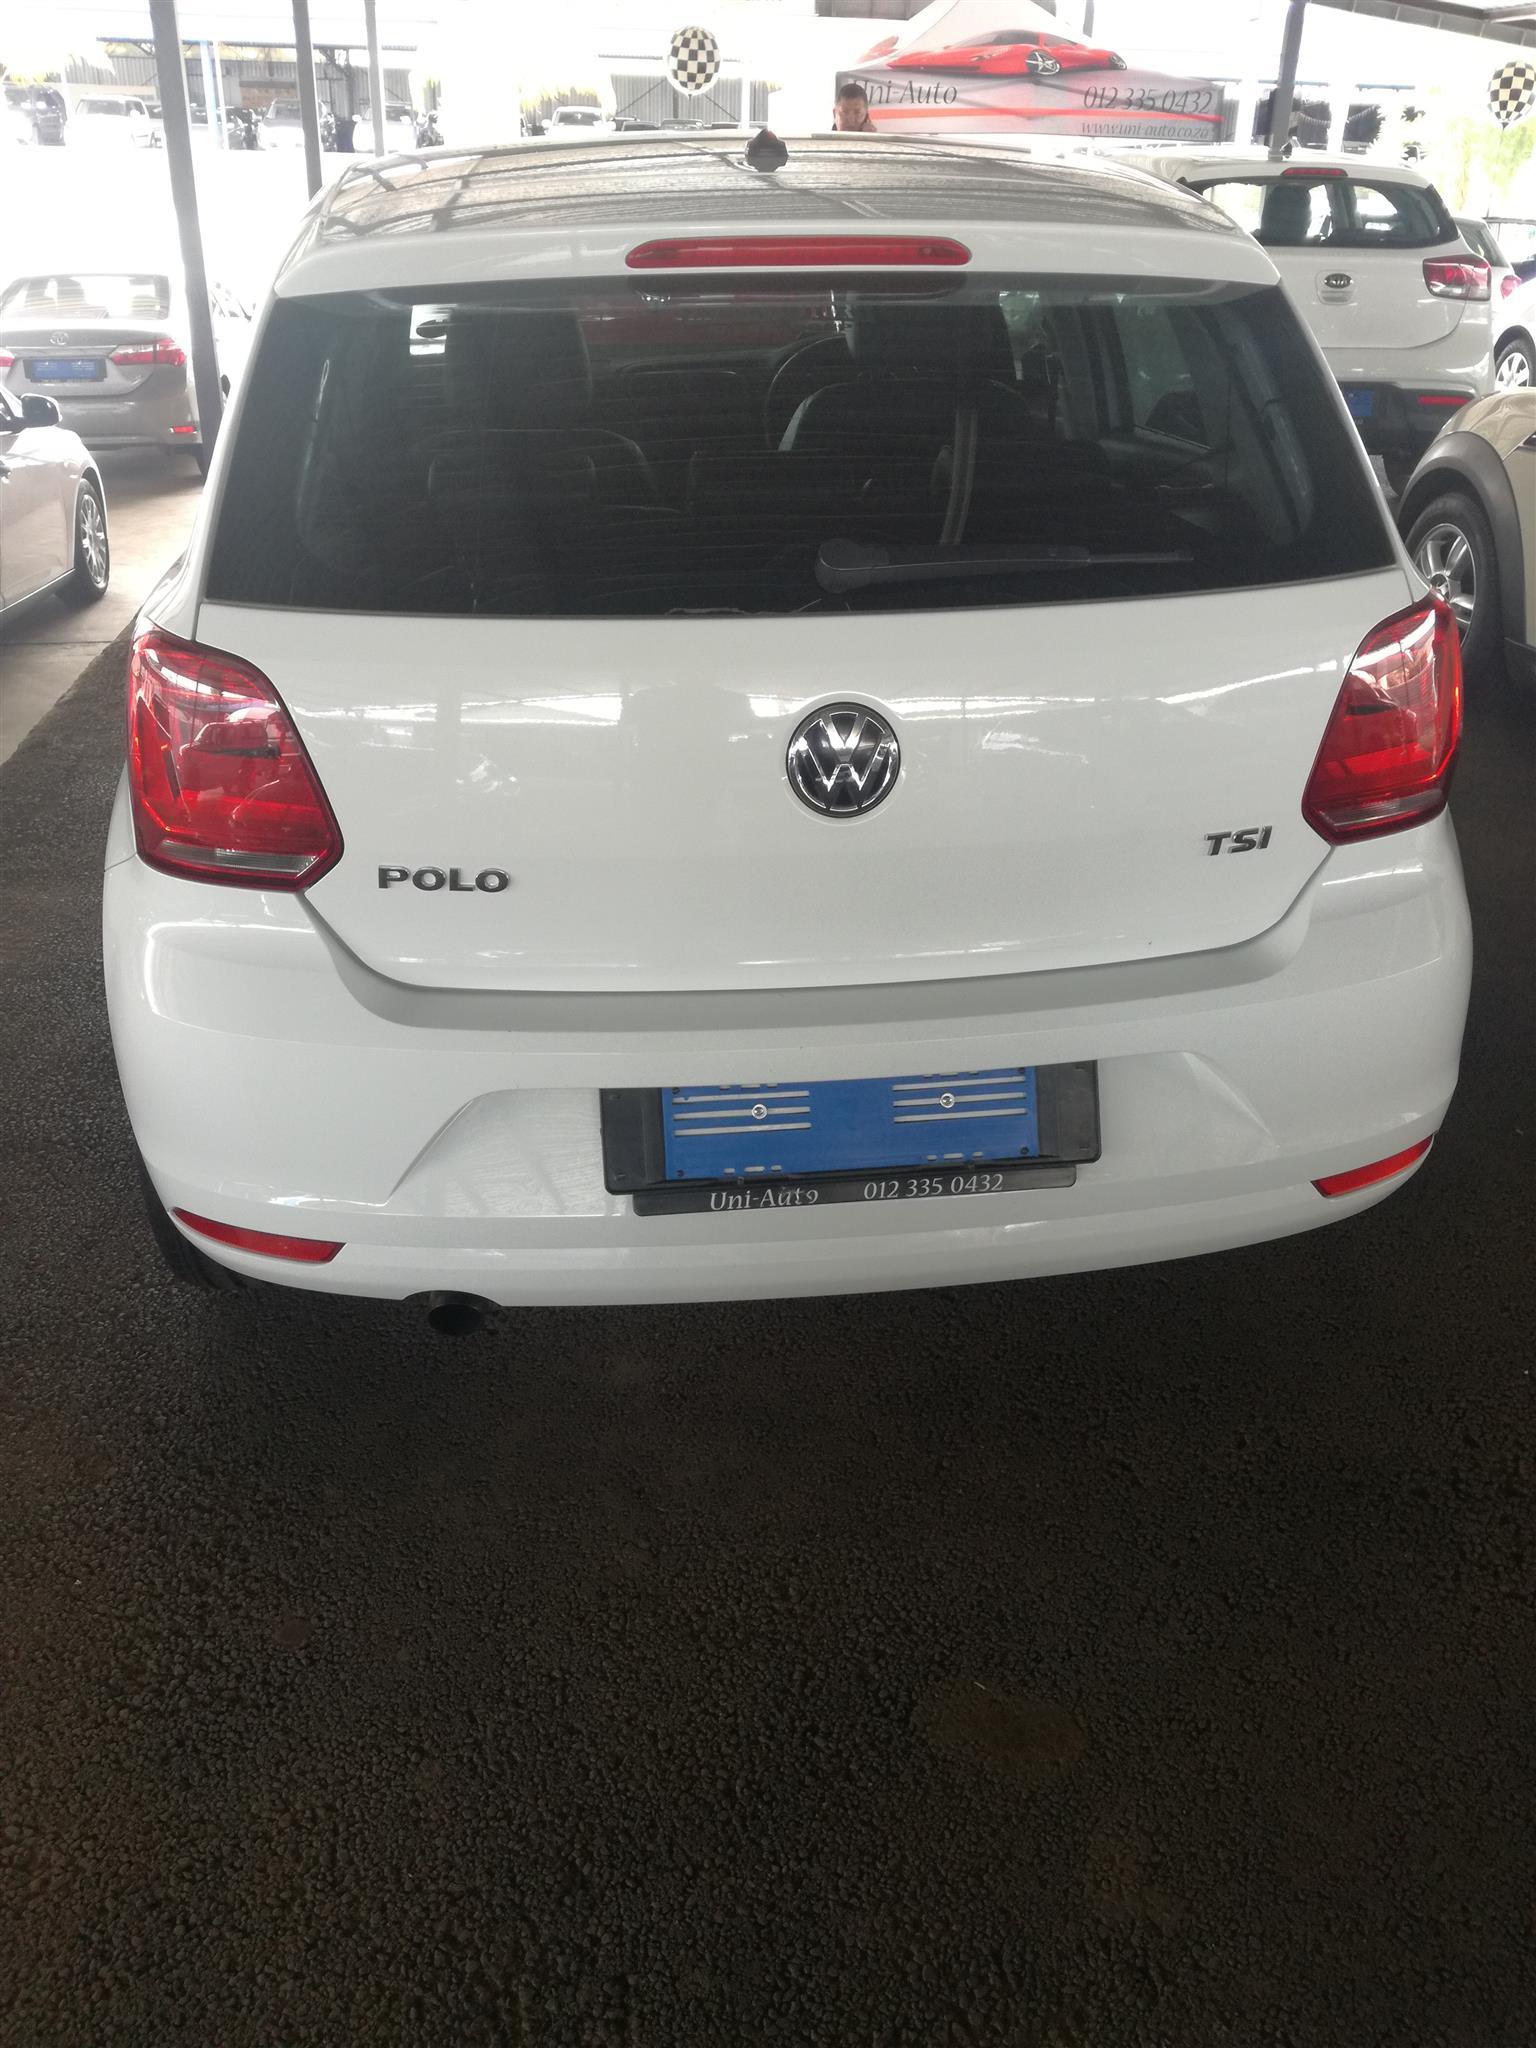 2015 VW Polo hatch POLO 1.0 TSI HIGHLINE DSG (85KW)